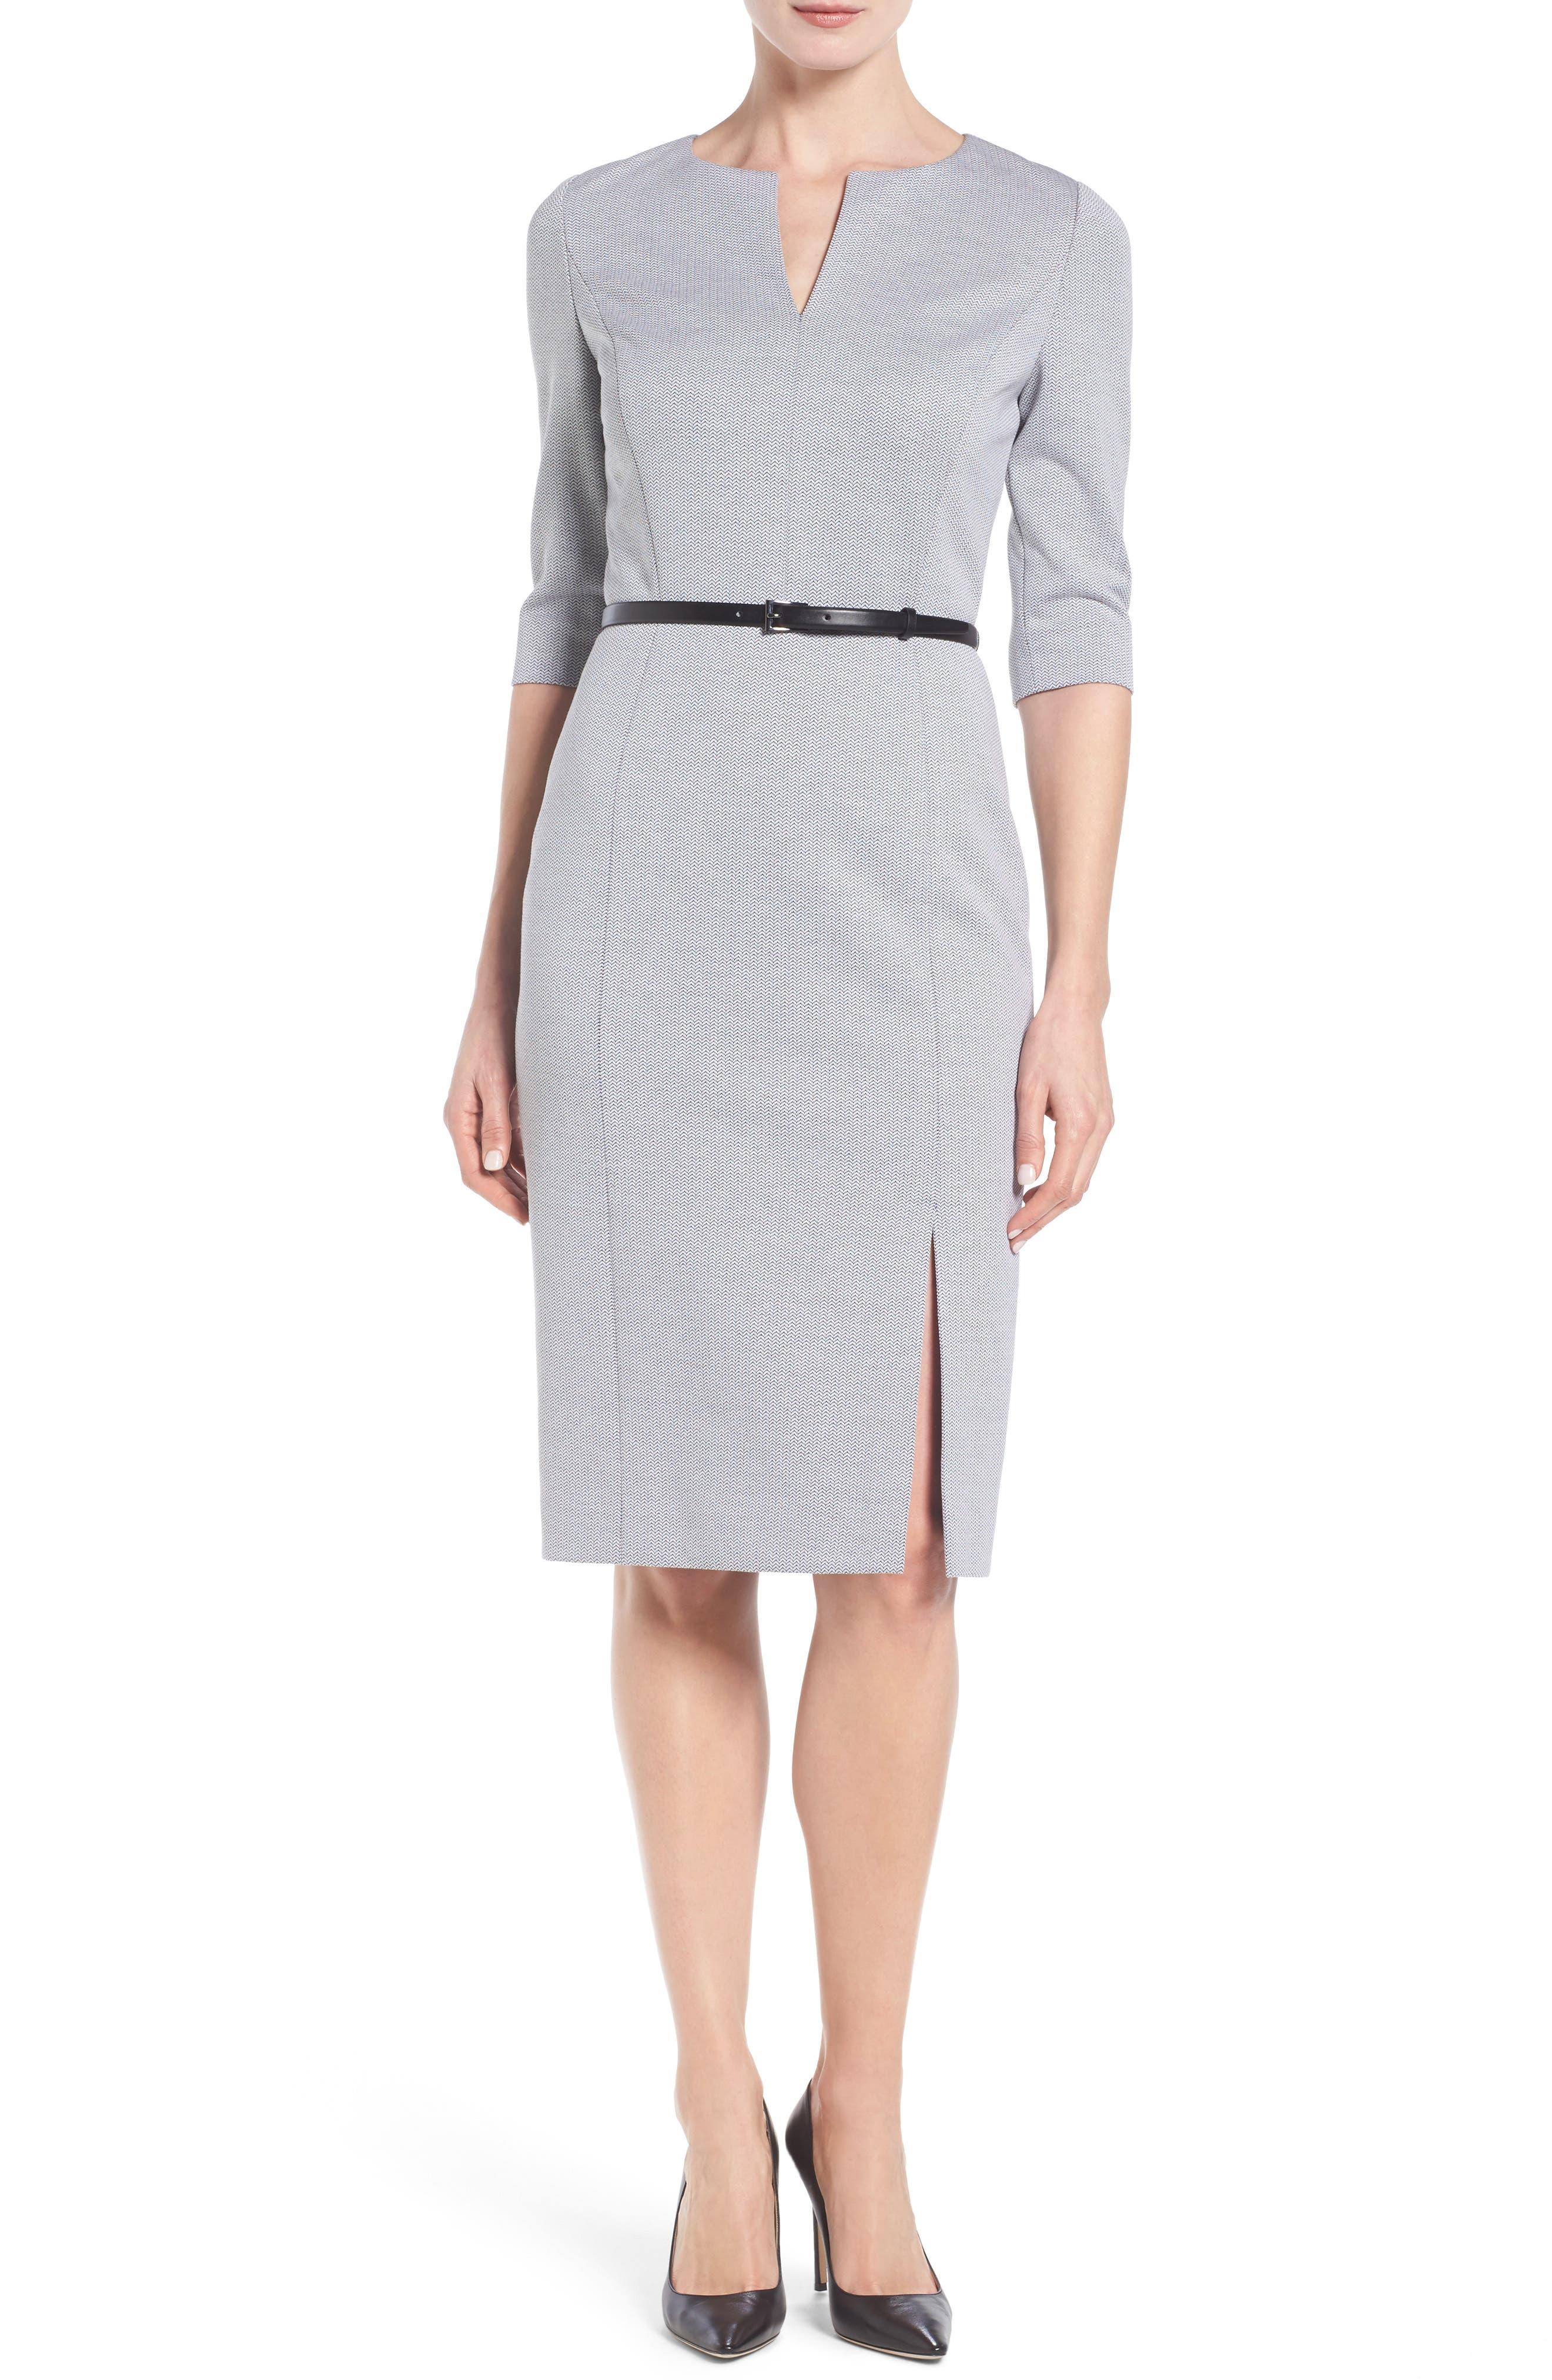 Alternate Image 1 Selected - Classiques Entier® Stretch Knit Sheath Dress